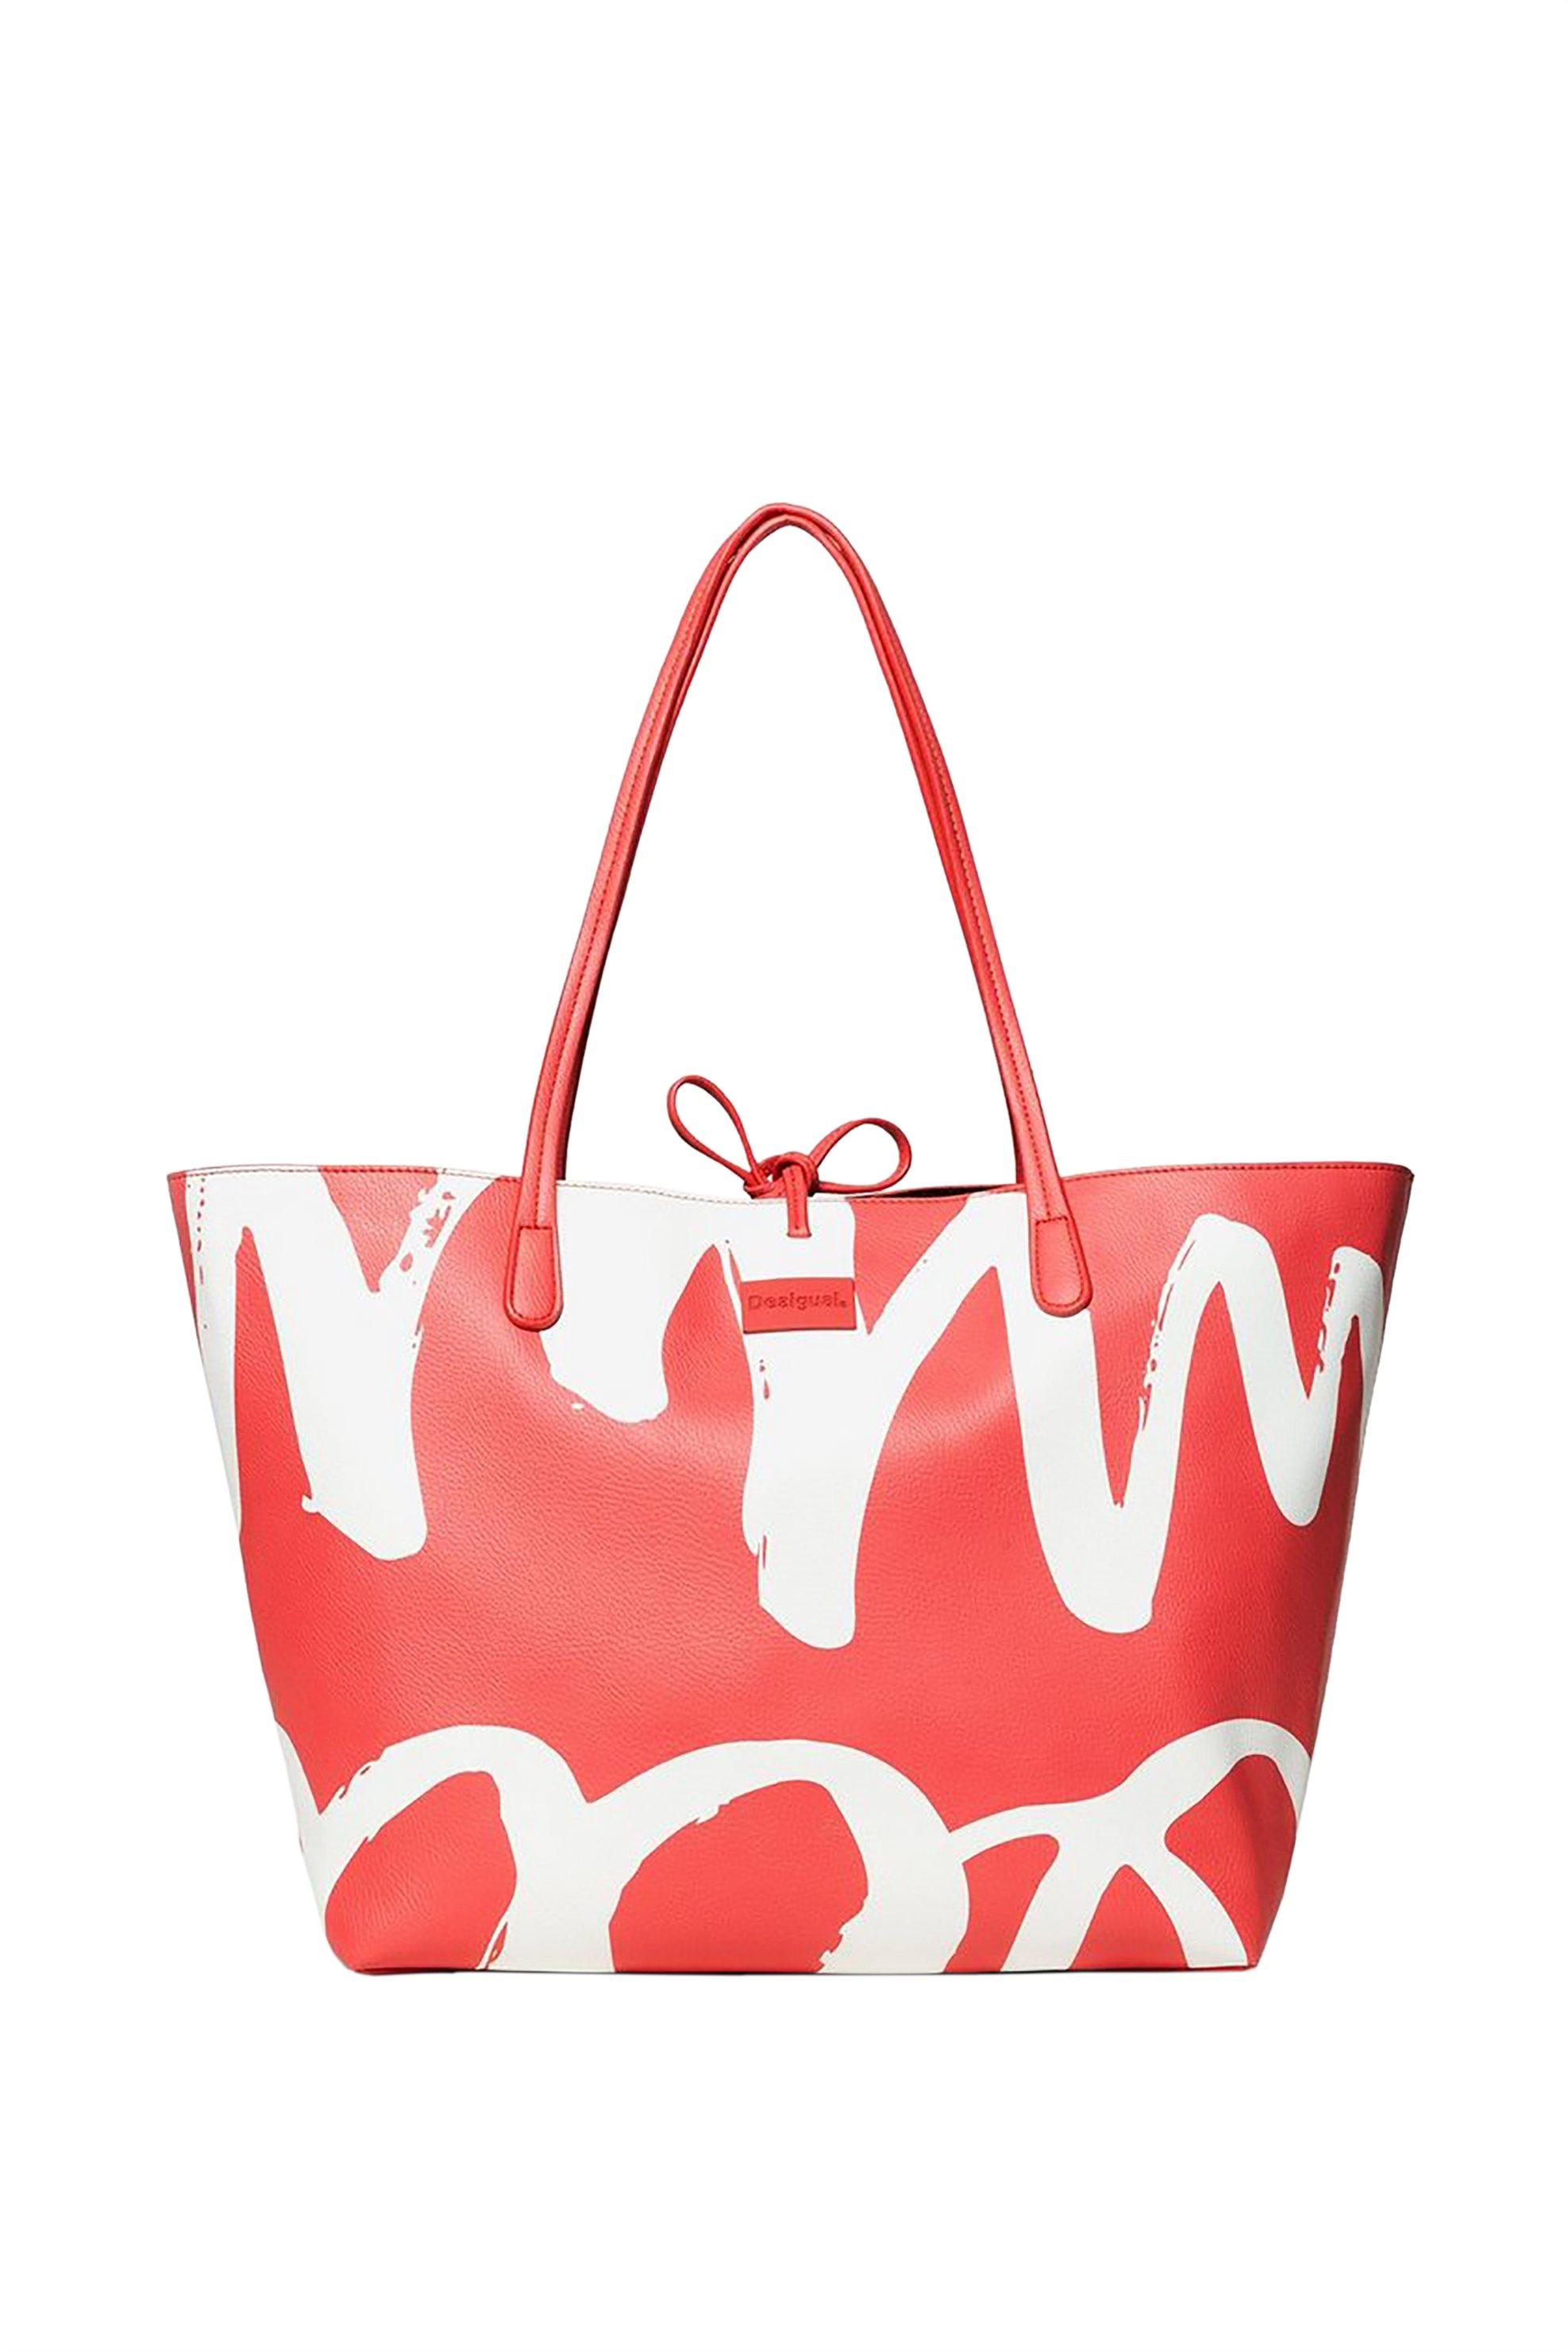 Desigual γυναικεία τσάντα shopper διπλής όψης με αφαιρούμενο τσαντάκι Capri - 19 γυναικα   τσαντεσ   ώμου   shopper bags